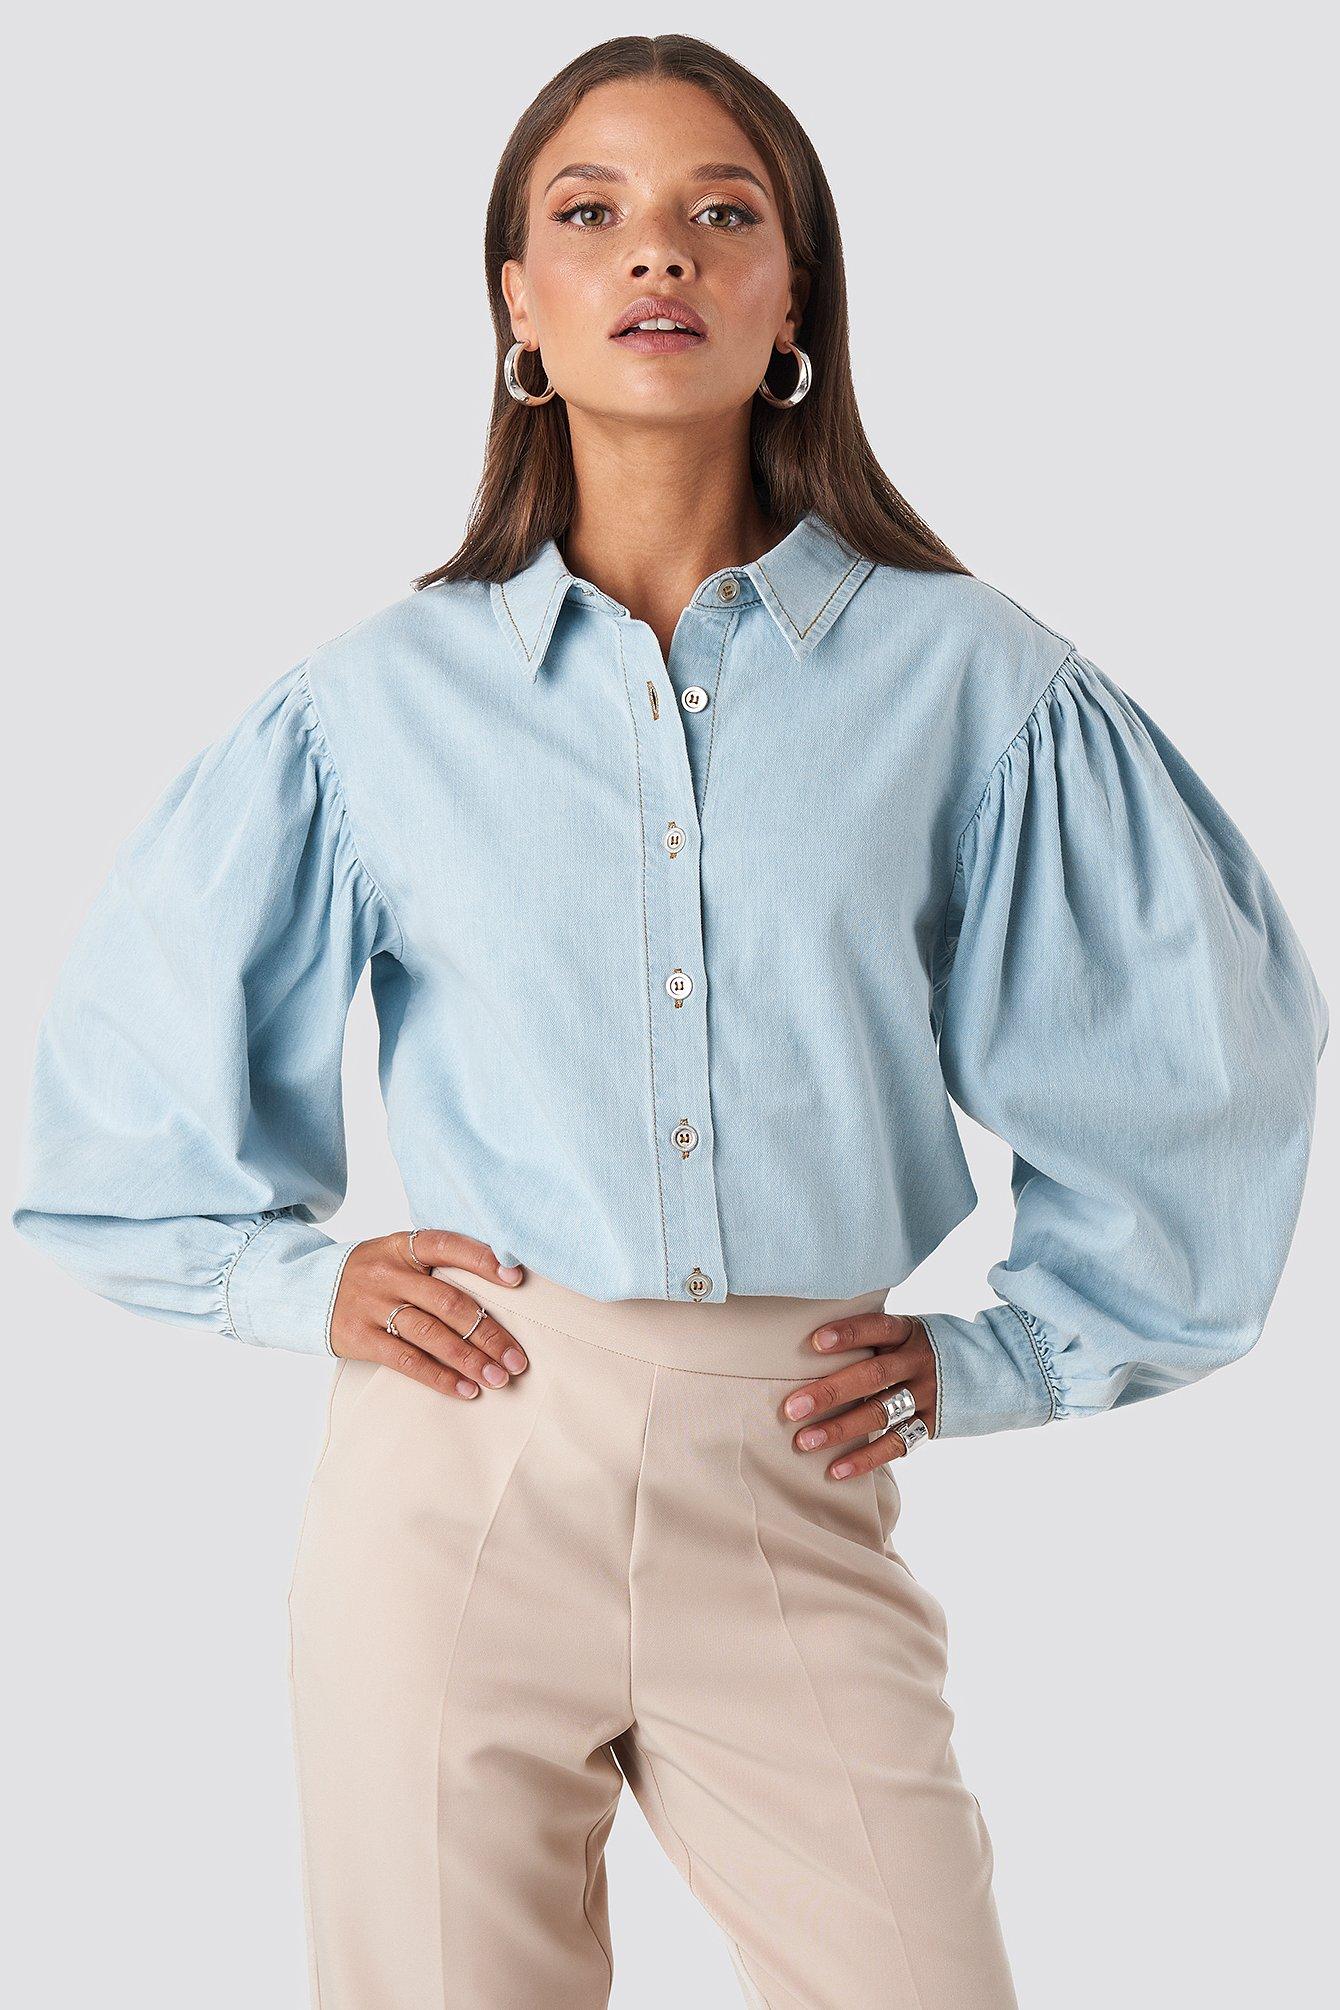 Puff Sleeve Denim Shirt Blue by Na Kd